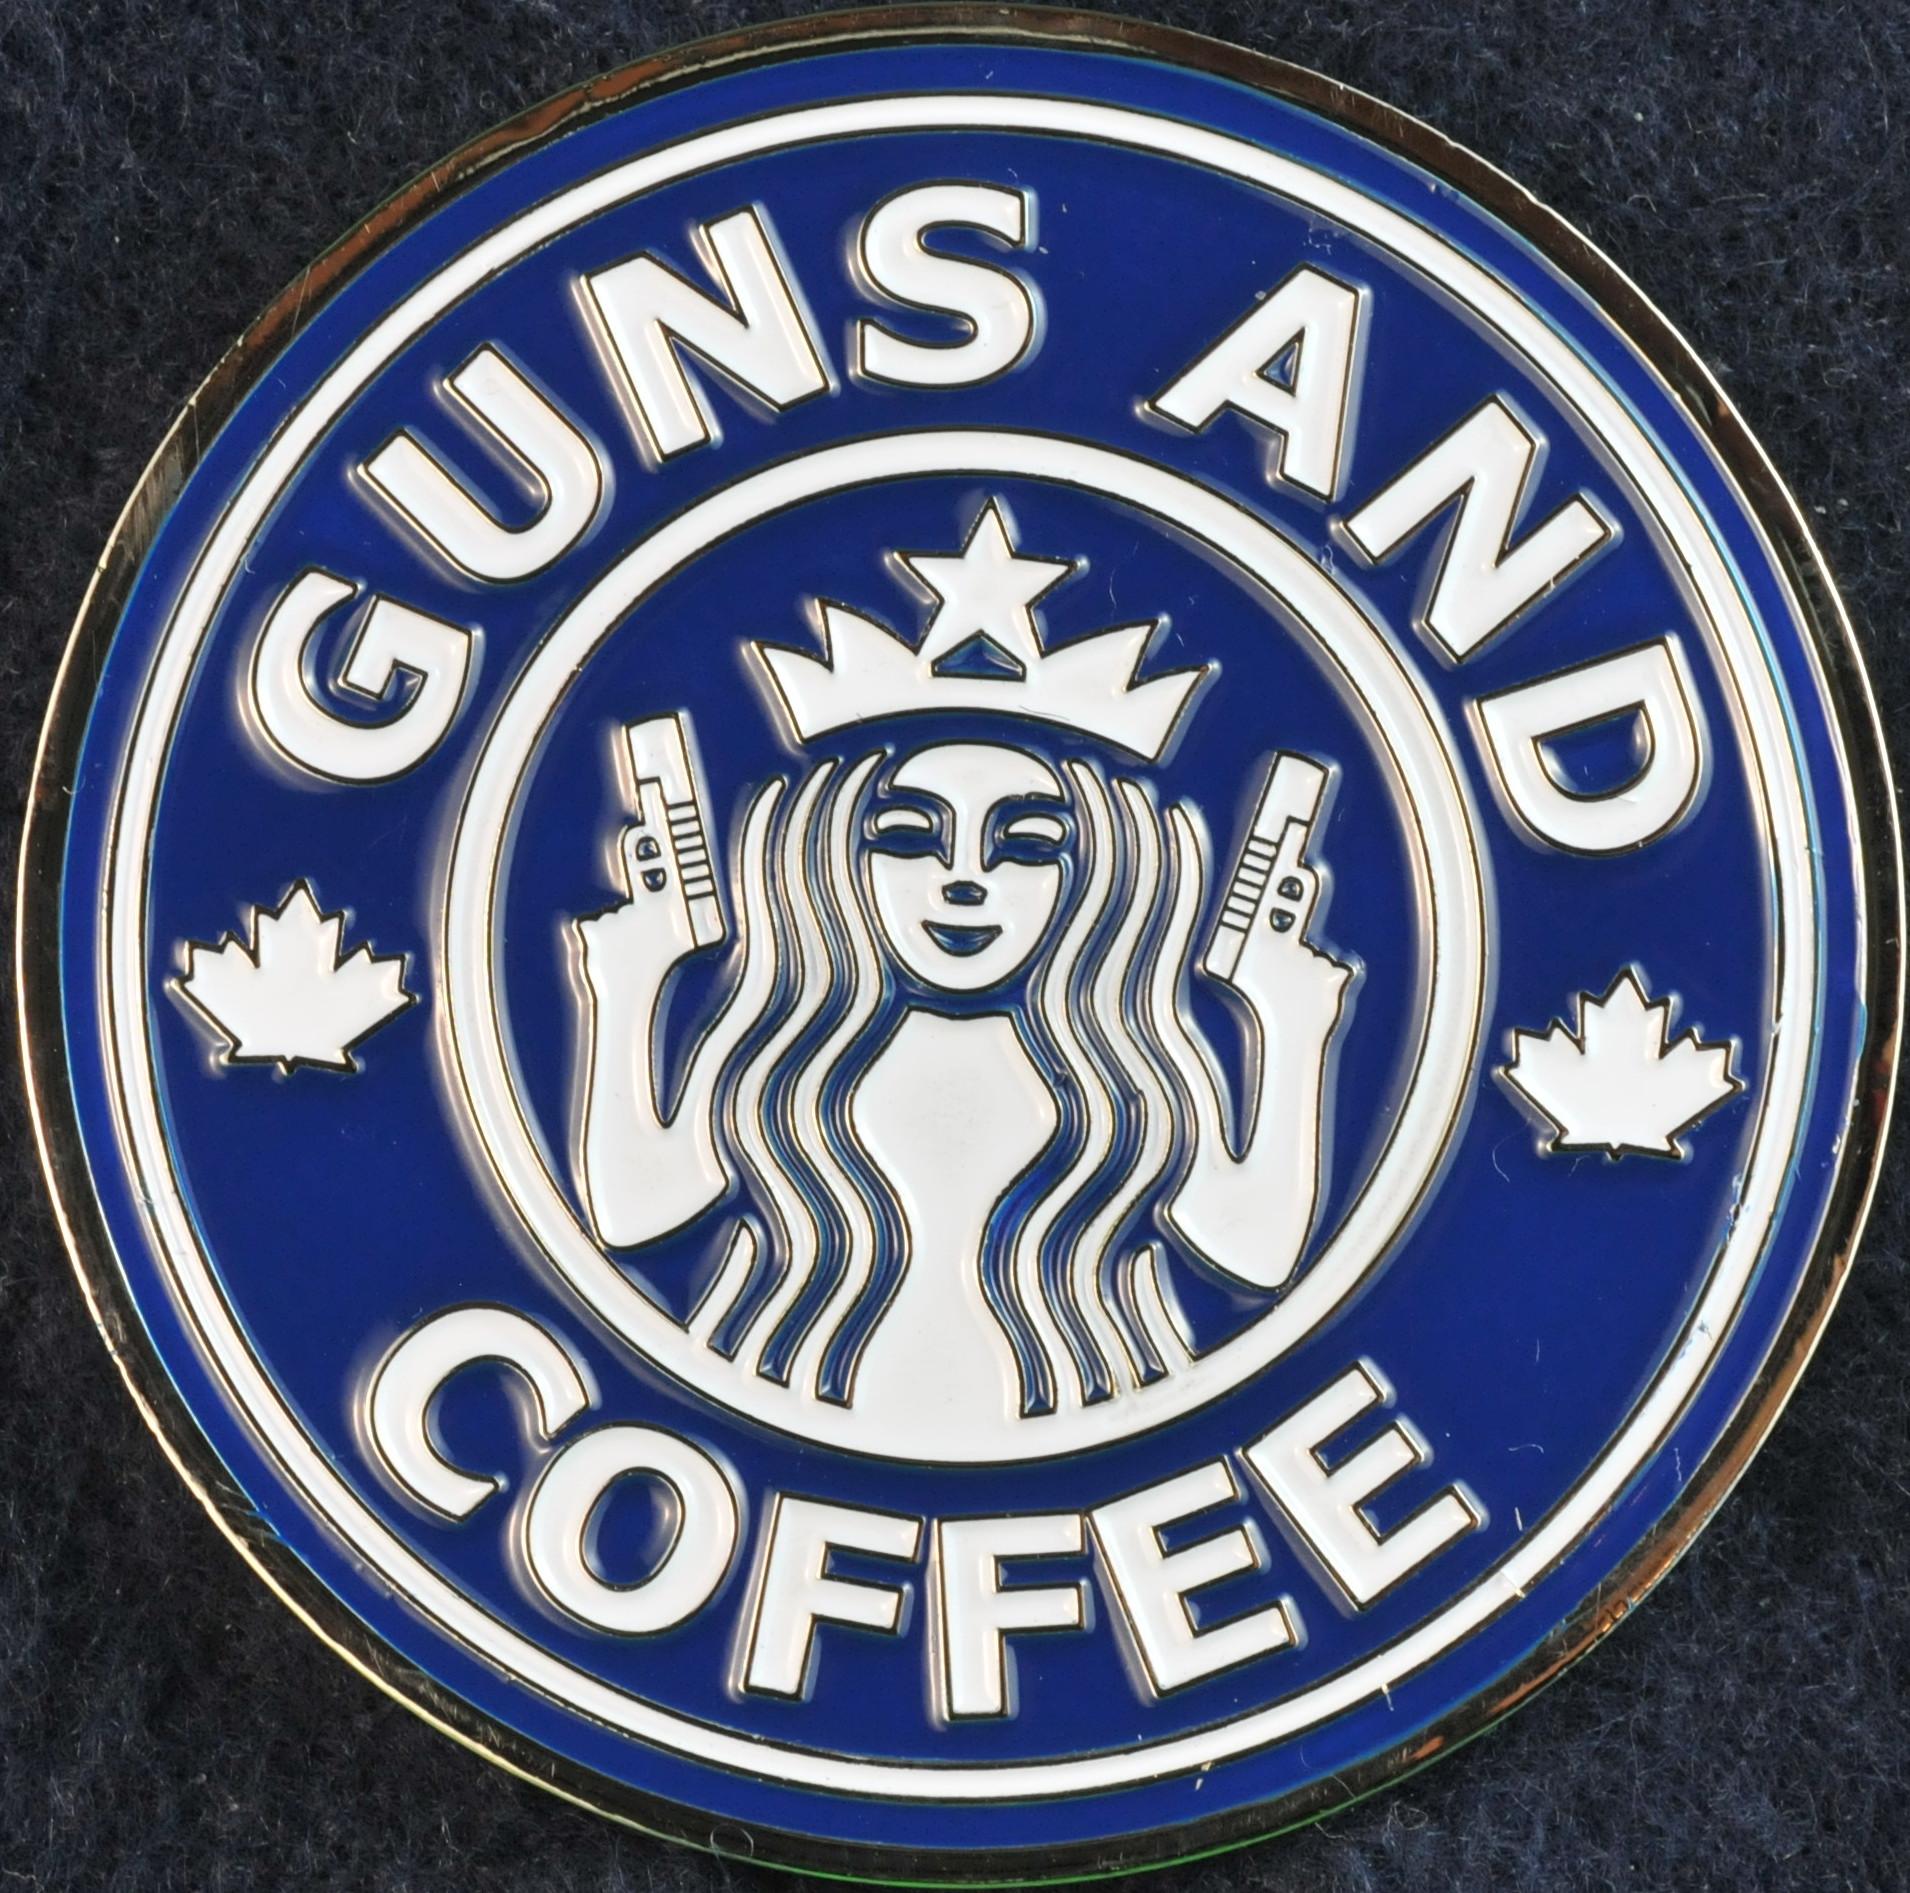 Toronto Police Service Guns And Coffee Blue